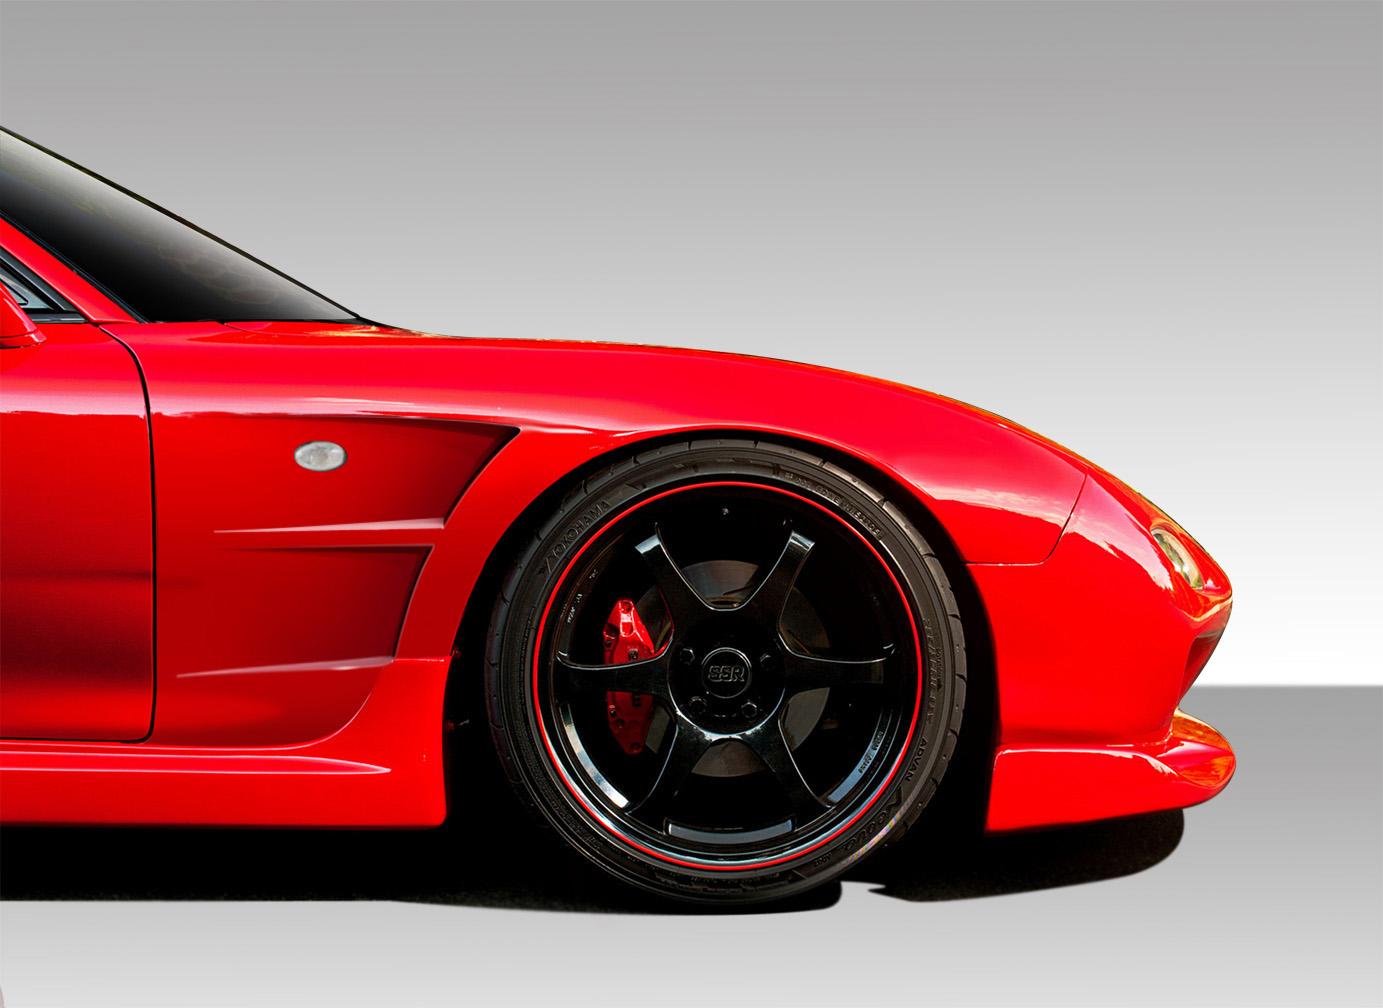 USパーツ 93-97マツダRX7 B - スポーツDuraflexボディキット - 25MMフロントフェンダー! 109059 93-97 Mazda RX7 B-Sport Duraflex Body Kit- 25MM Front Fenders!!! 109059